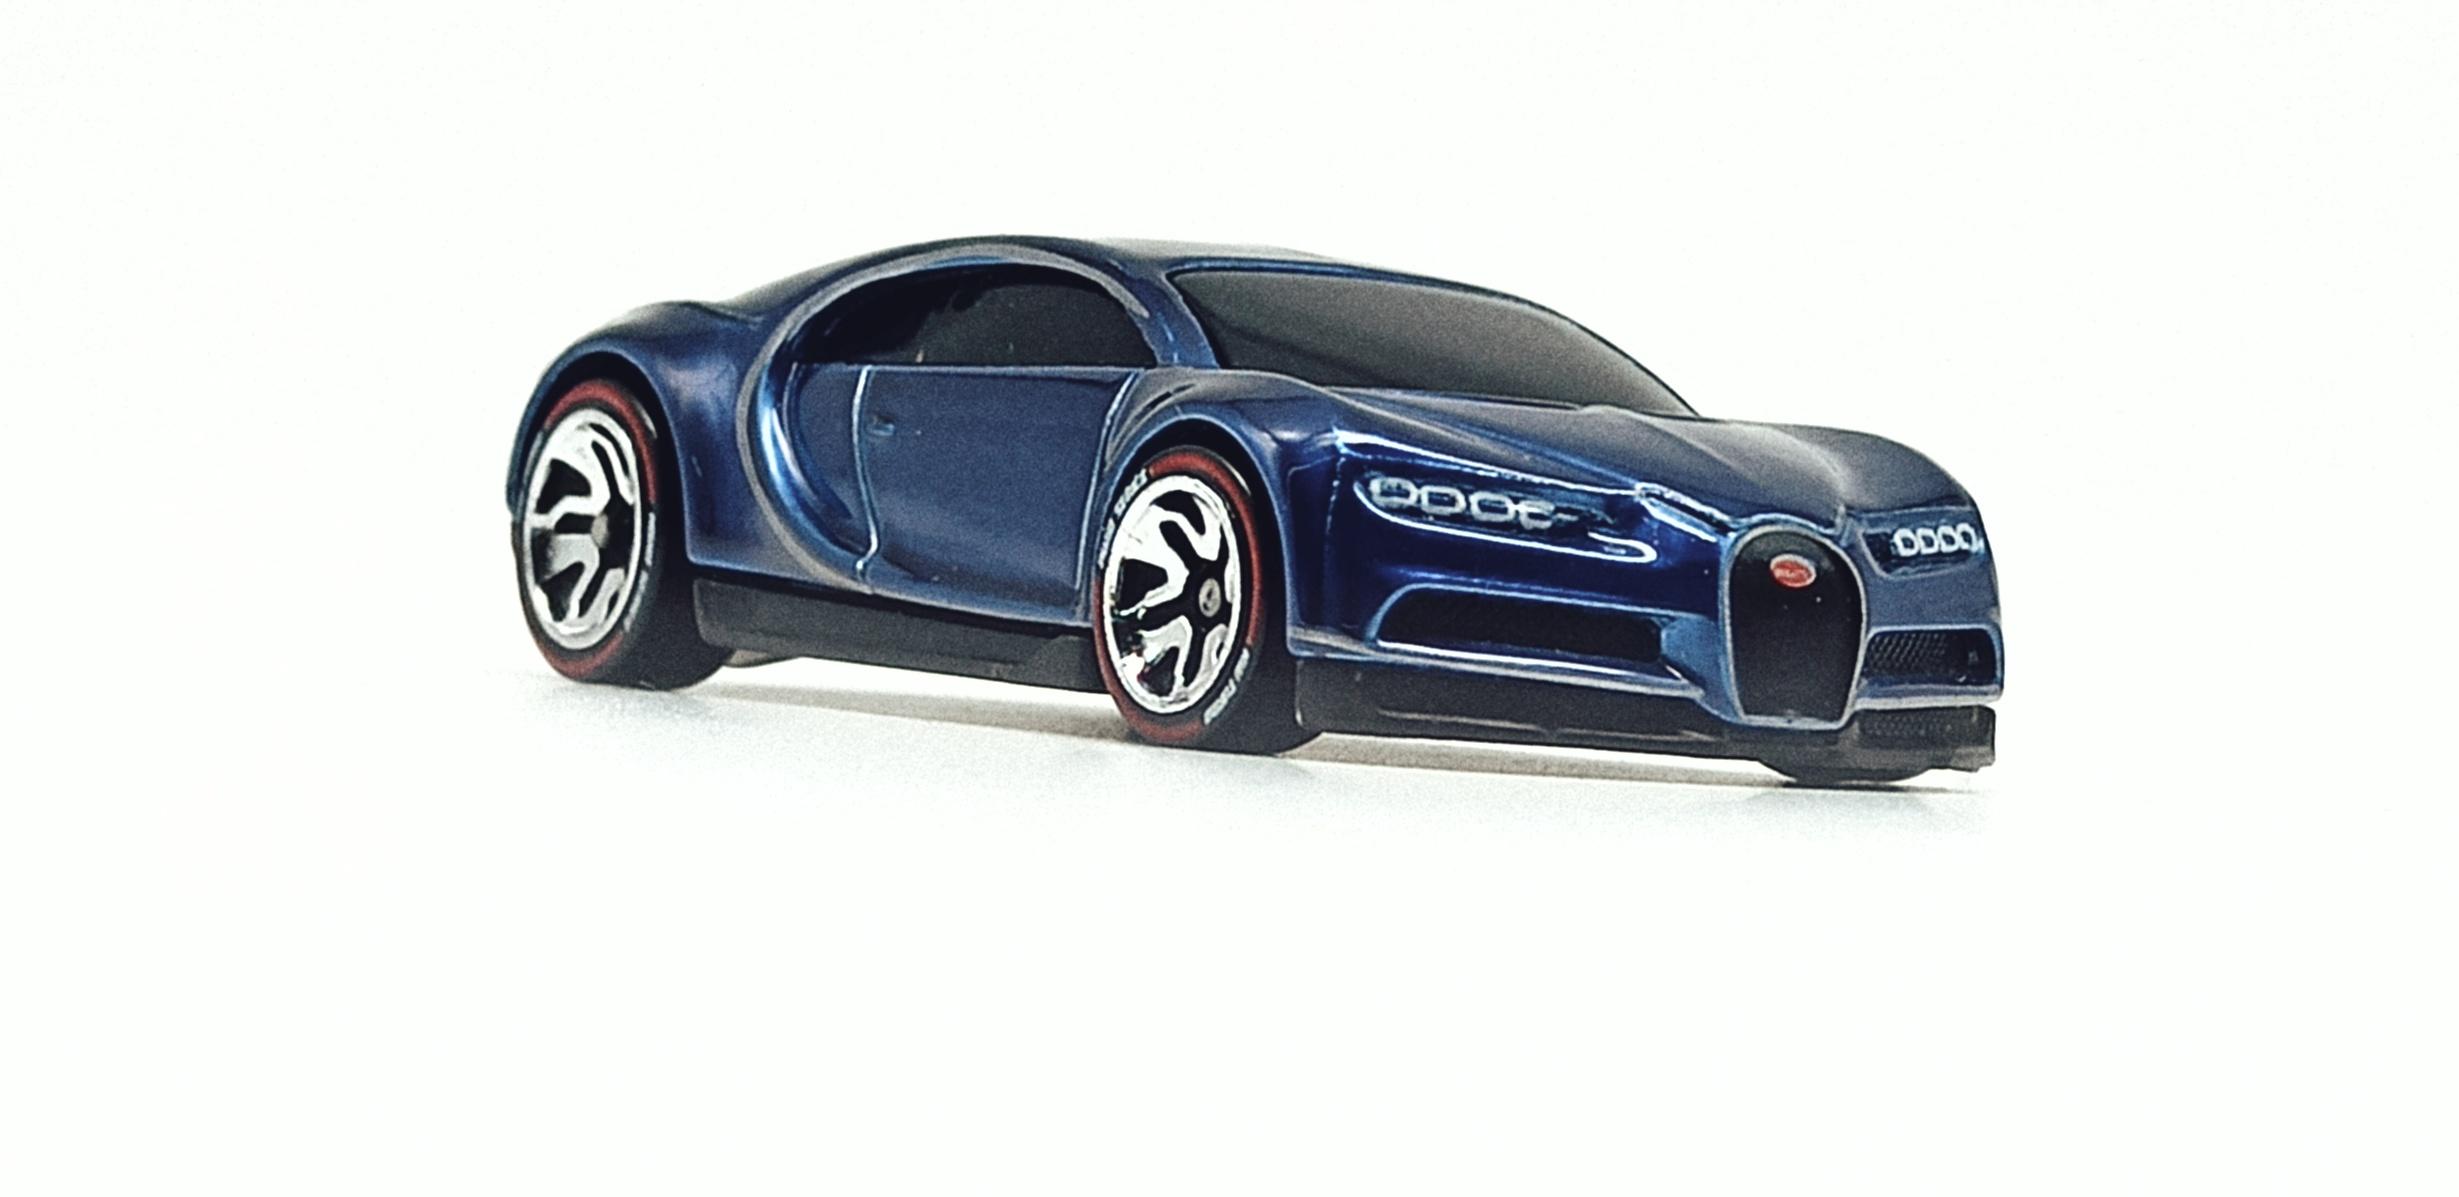 Hot Wheels id '16 Bugatti Chiron (HBG00) 2021 HW Turbo (3/4) spectraflame blue front angle